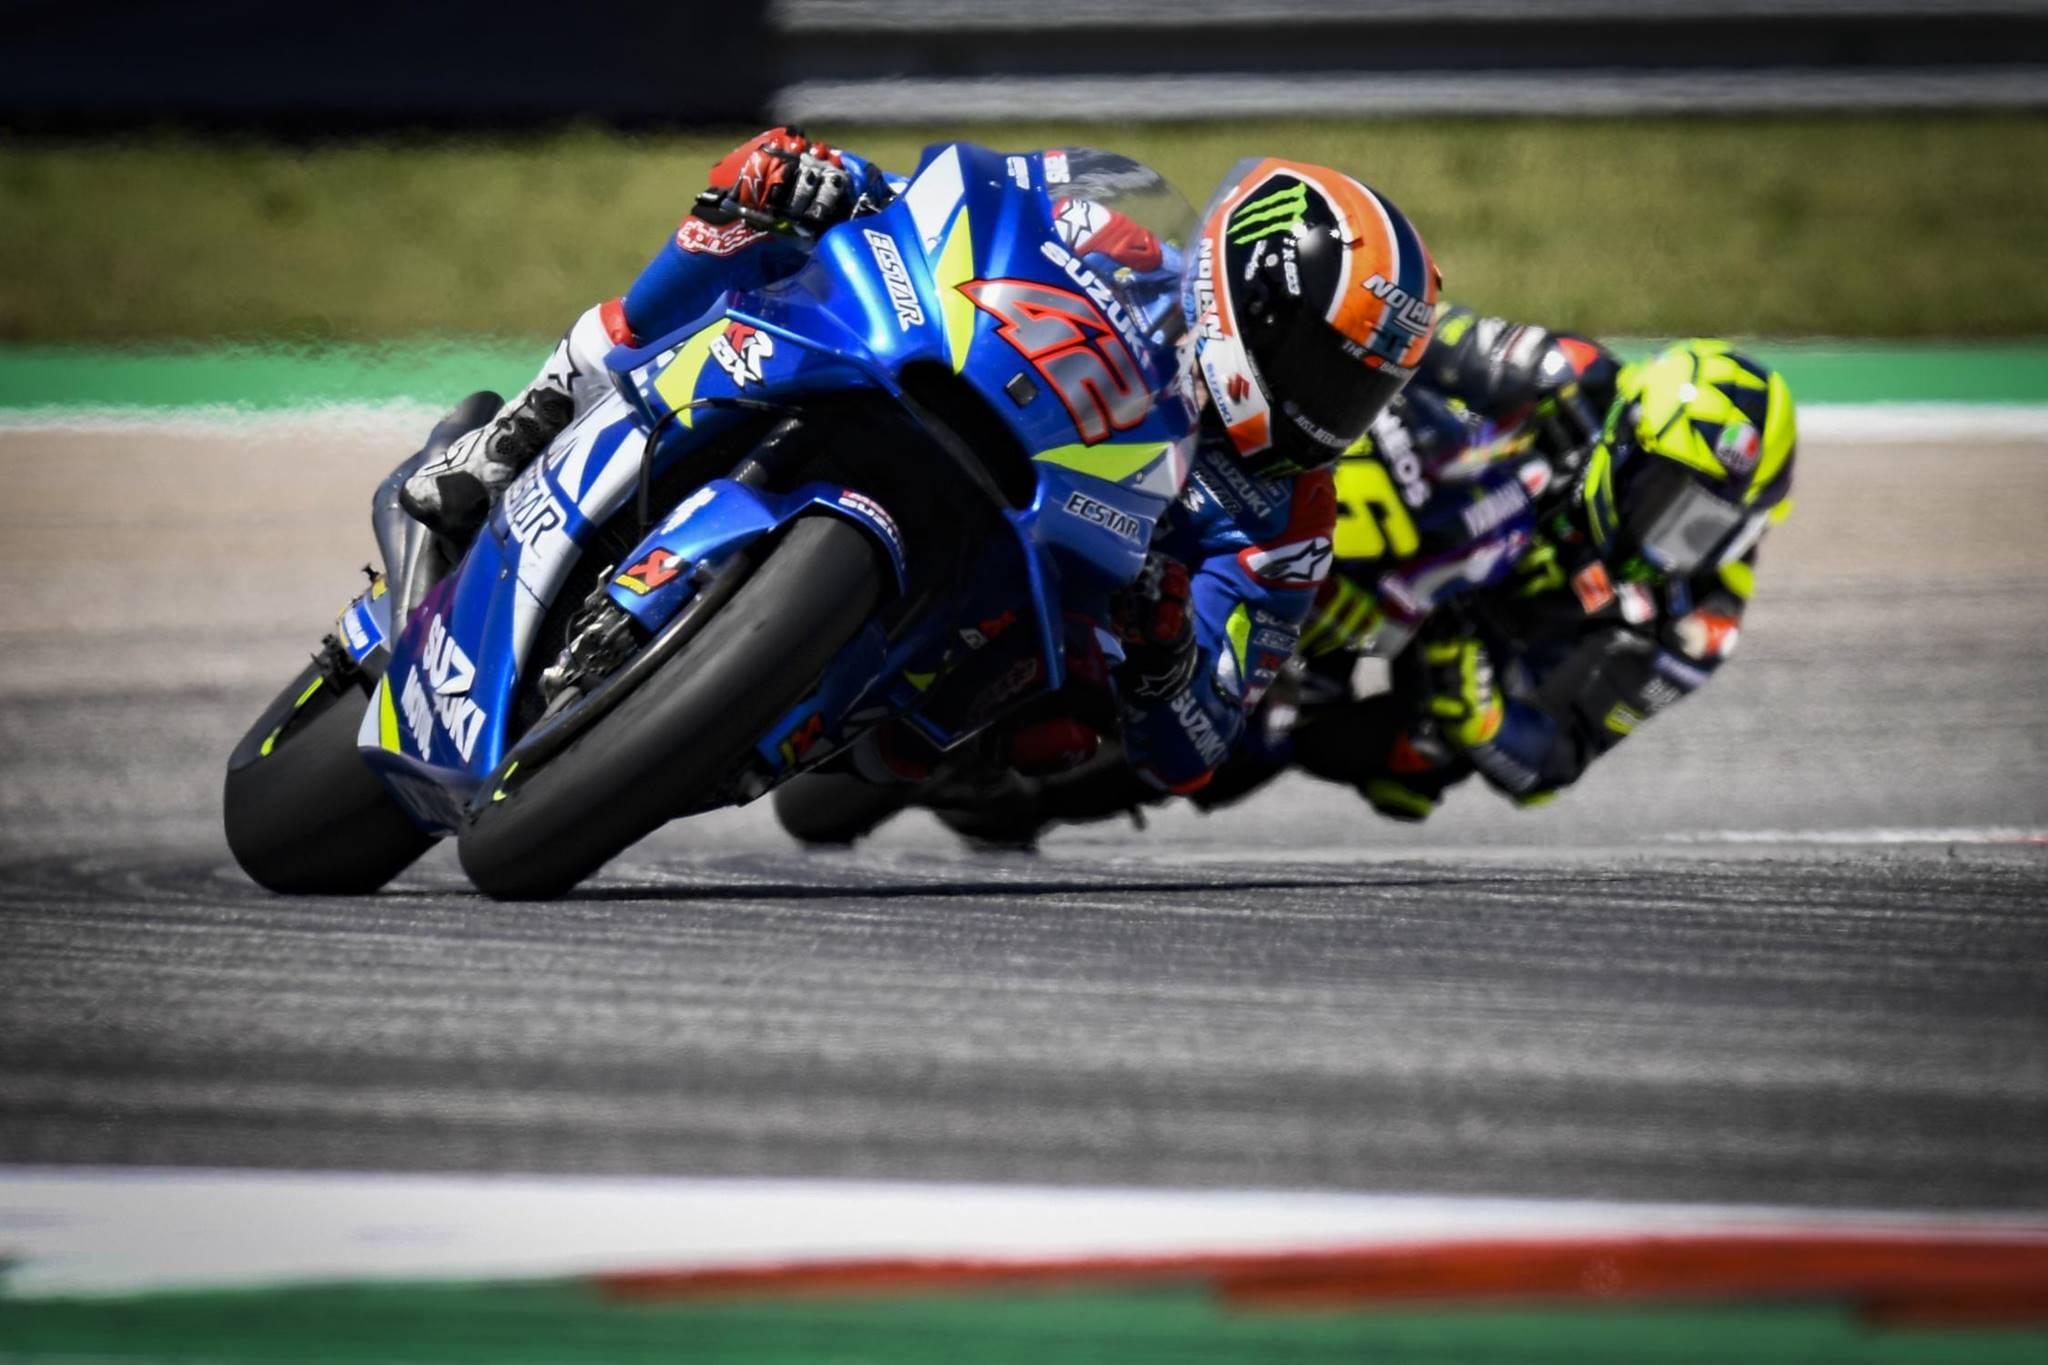 MotoGP_2019_AmericasGP_Xe_Tinhte_013.jpg